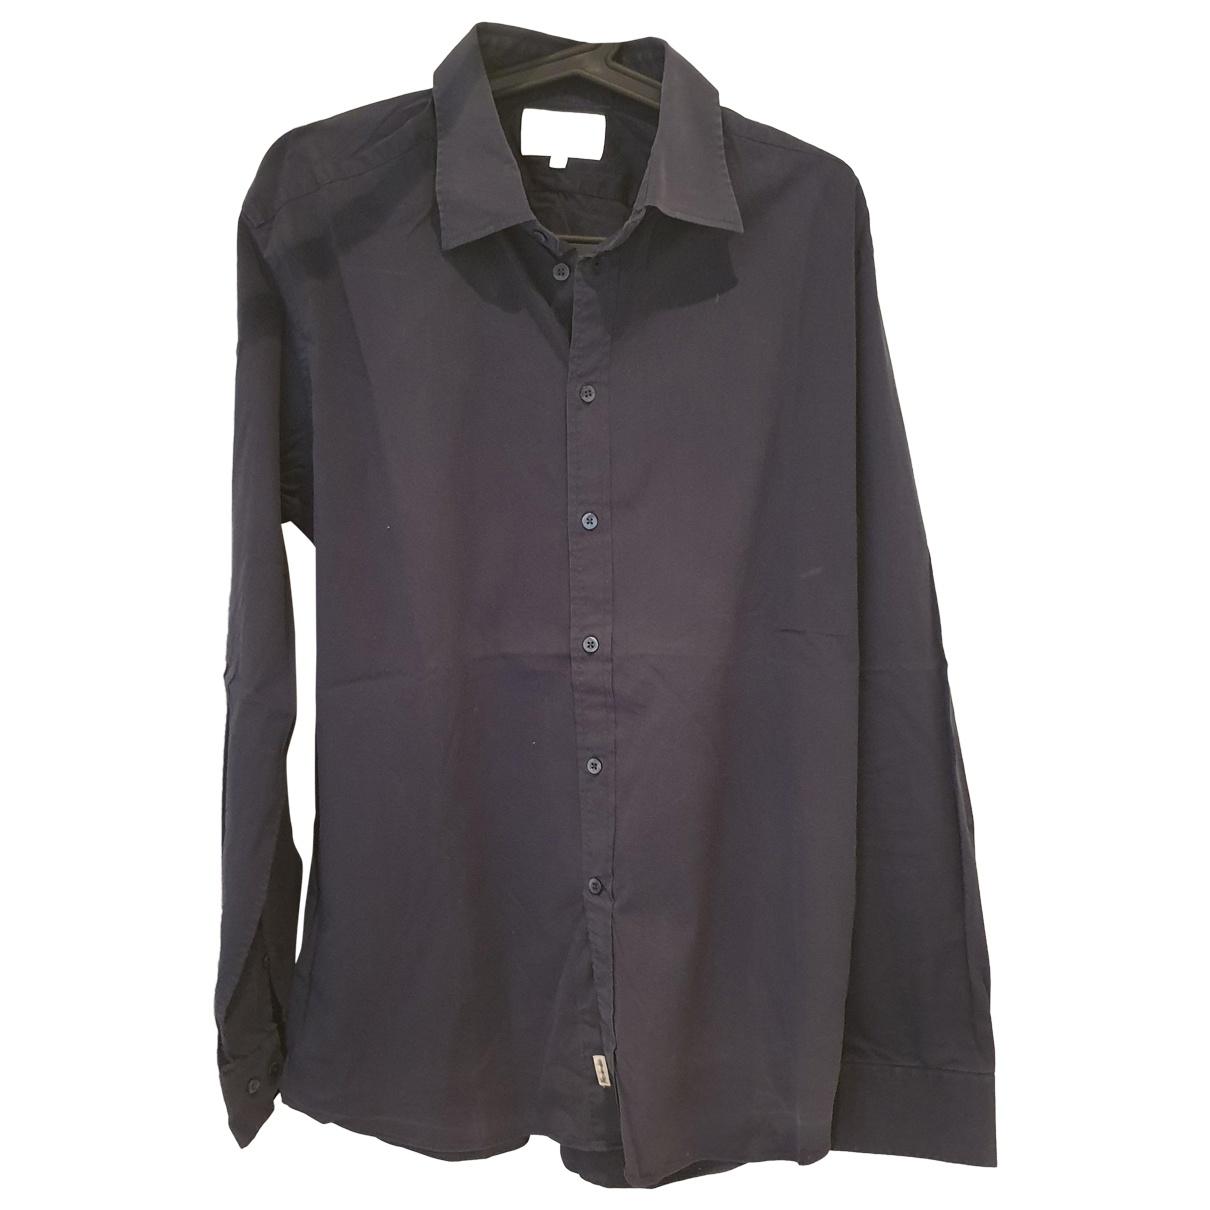 Faconnable \N Burgundy Cotton Shirts for Men XL International